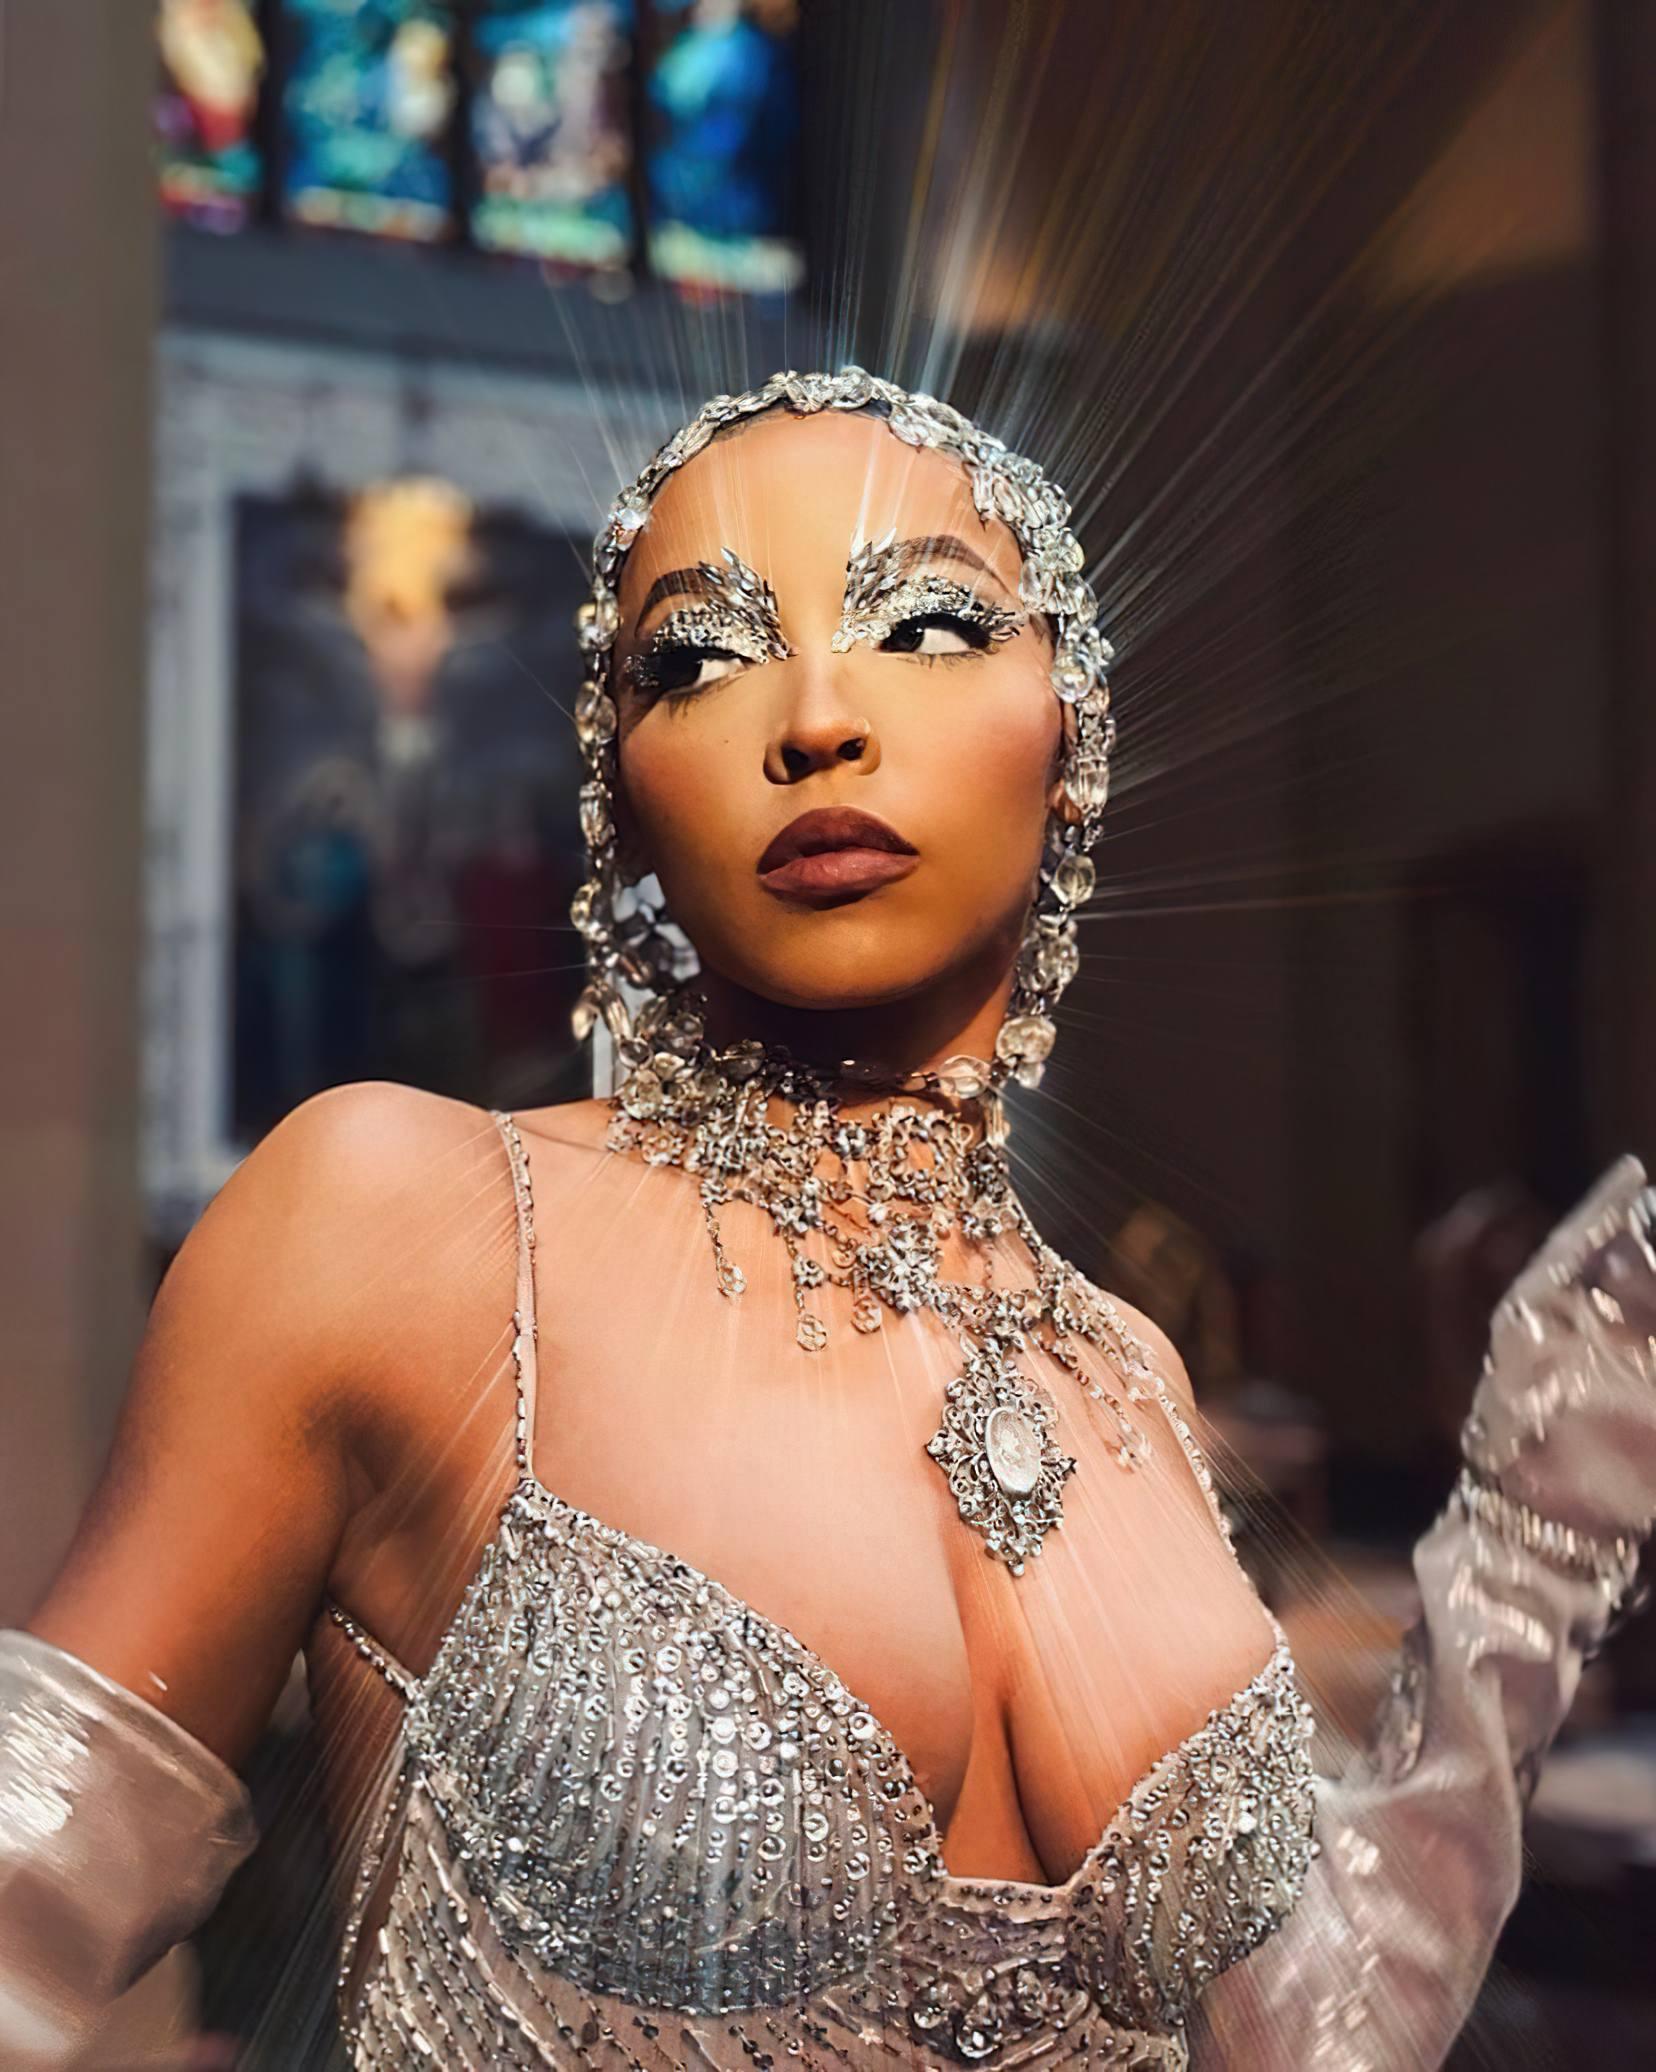 Tinashe Beautiful Boobs | Hot Celebs Home